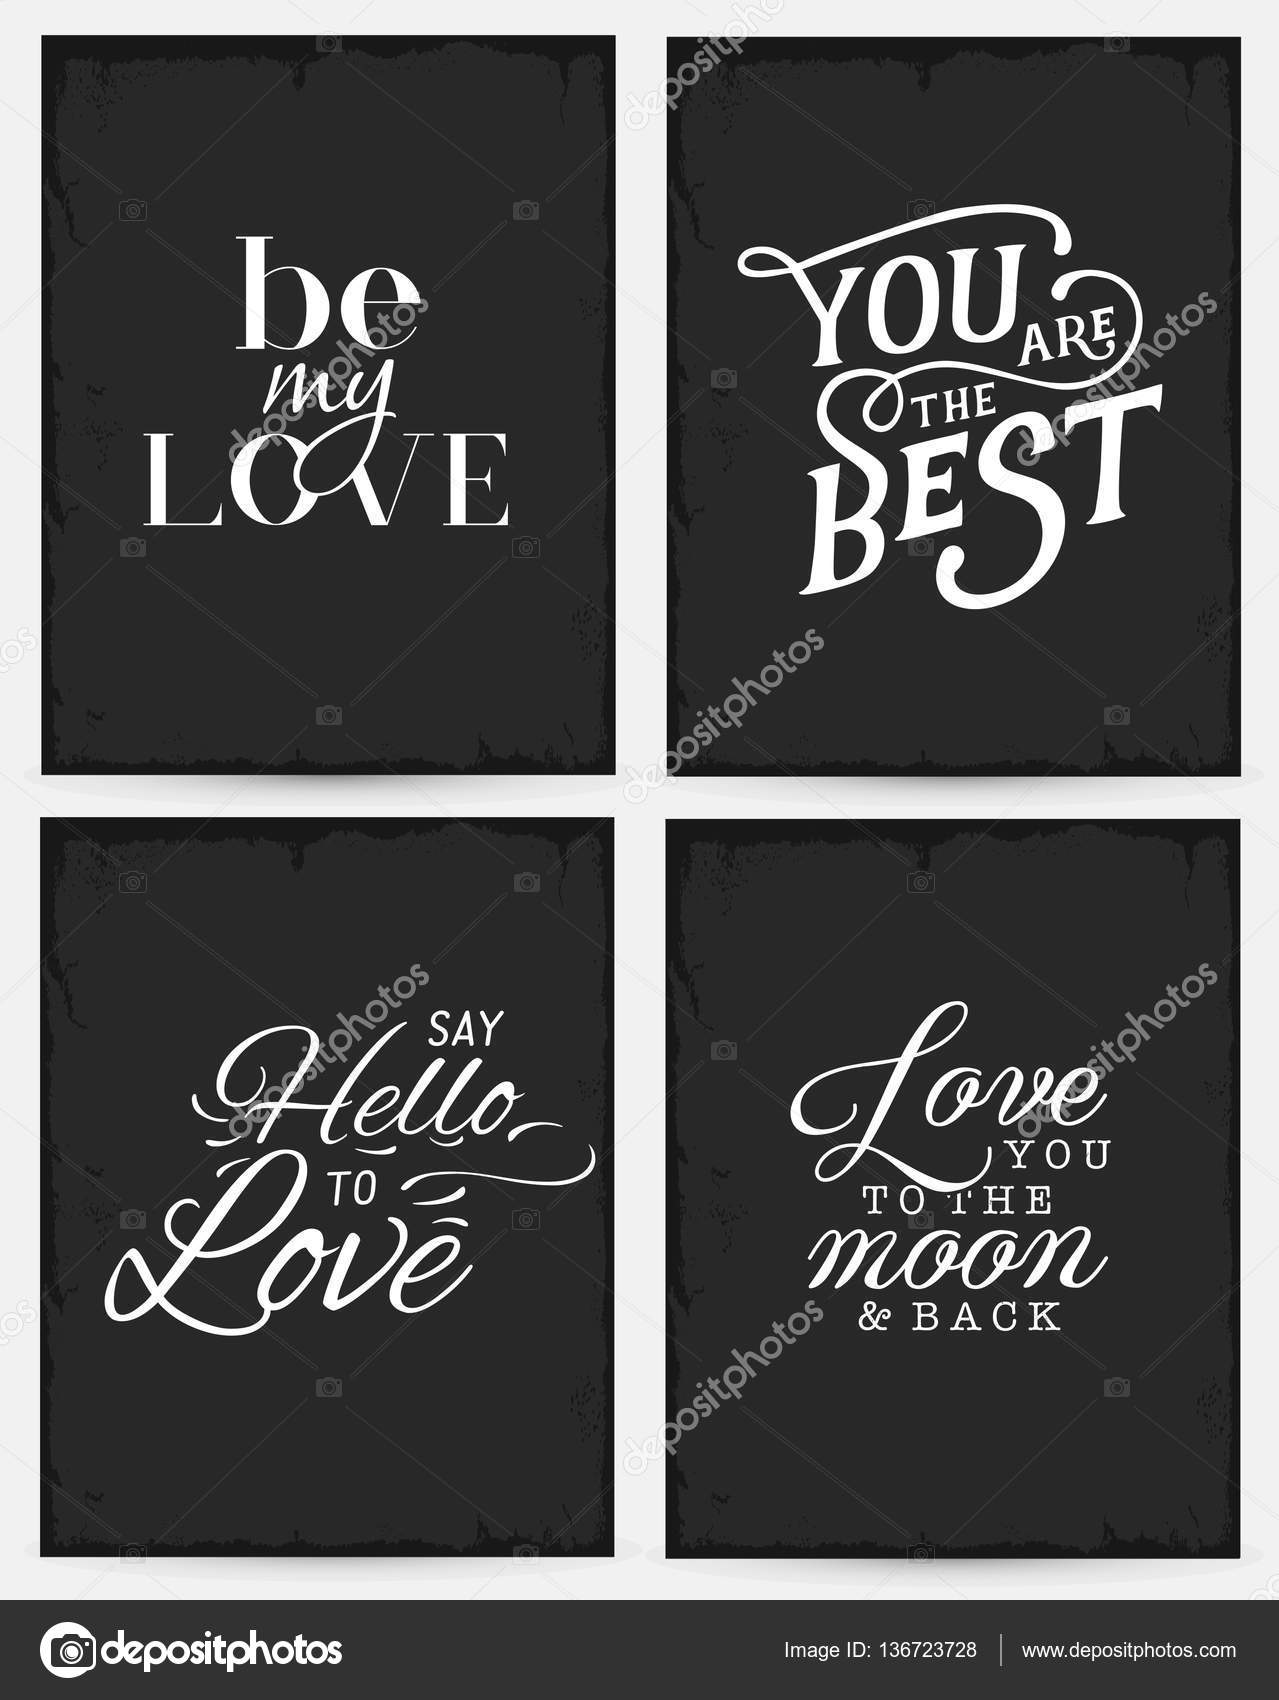 Valentines day minimal typography greeting cards set in vintage valentines day minimal typography greeting cards set in vintage style stock vector m4hsunfo